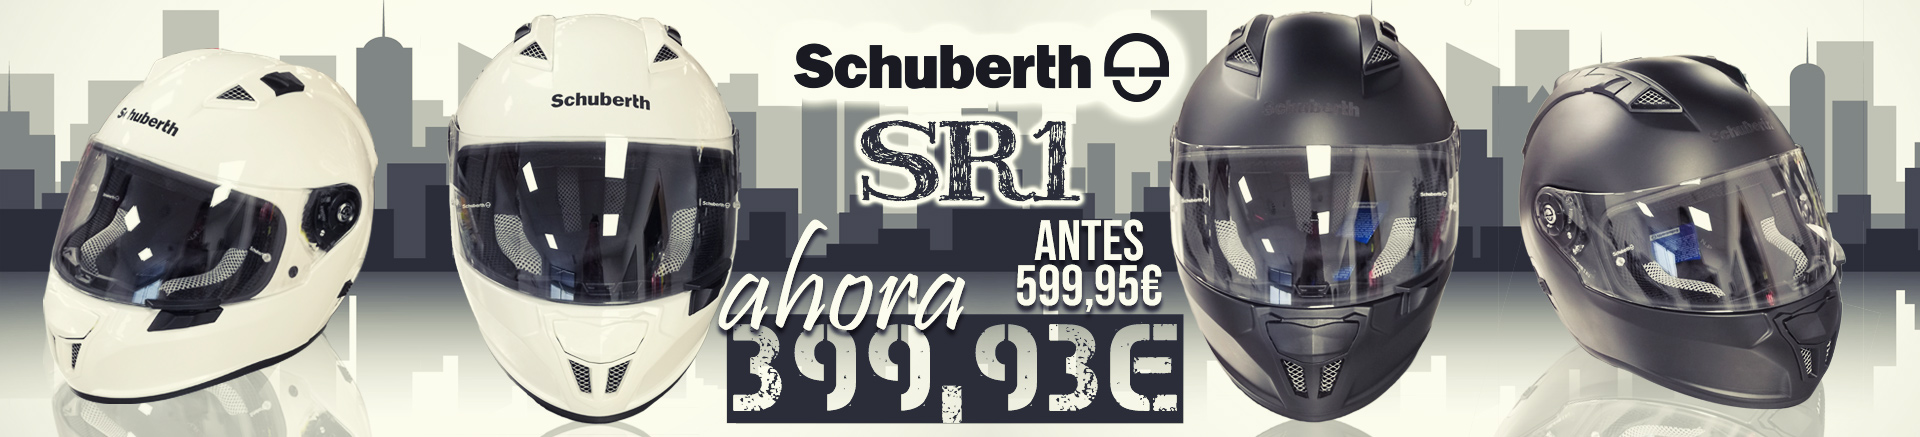 266824-1530704116